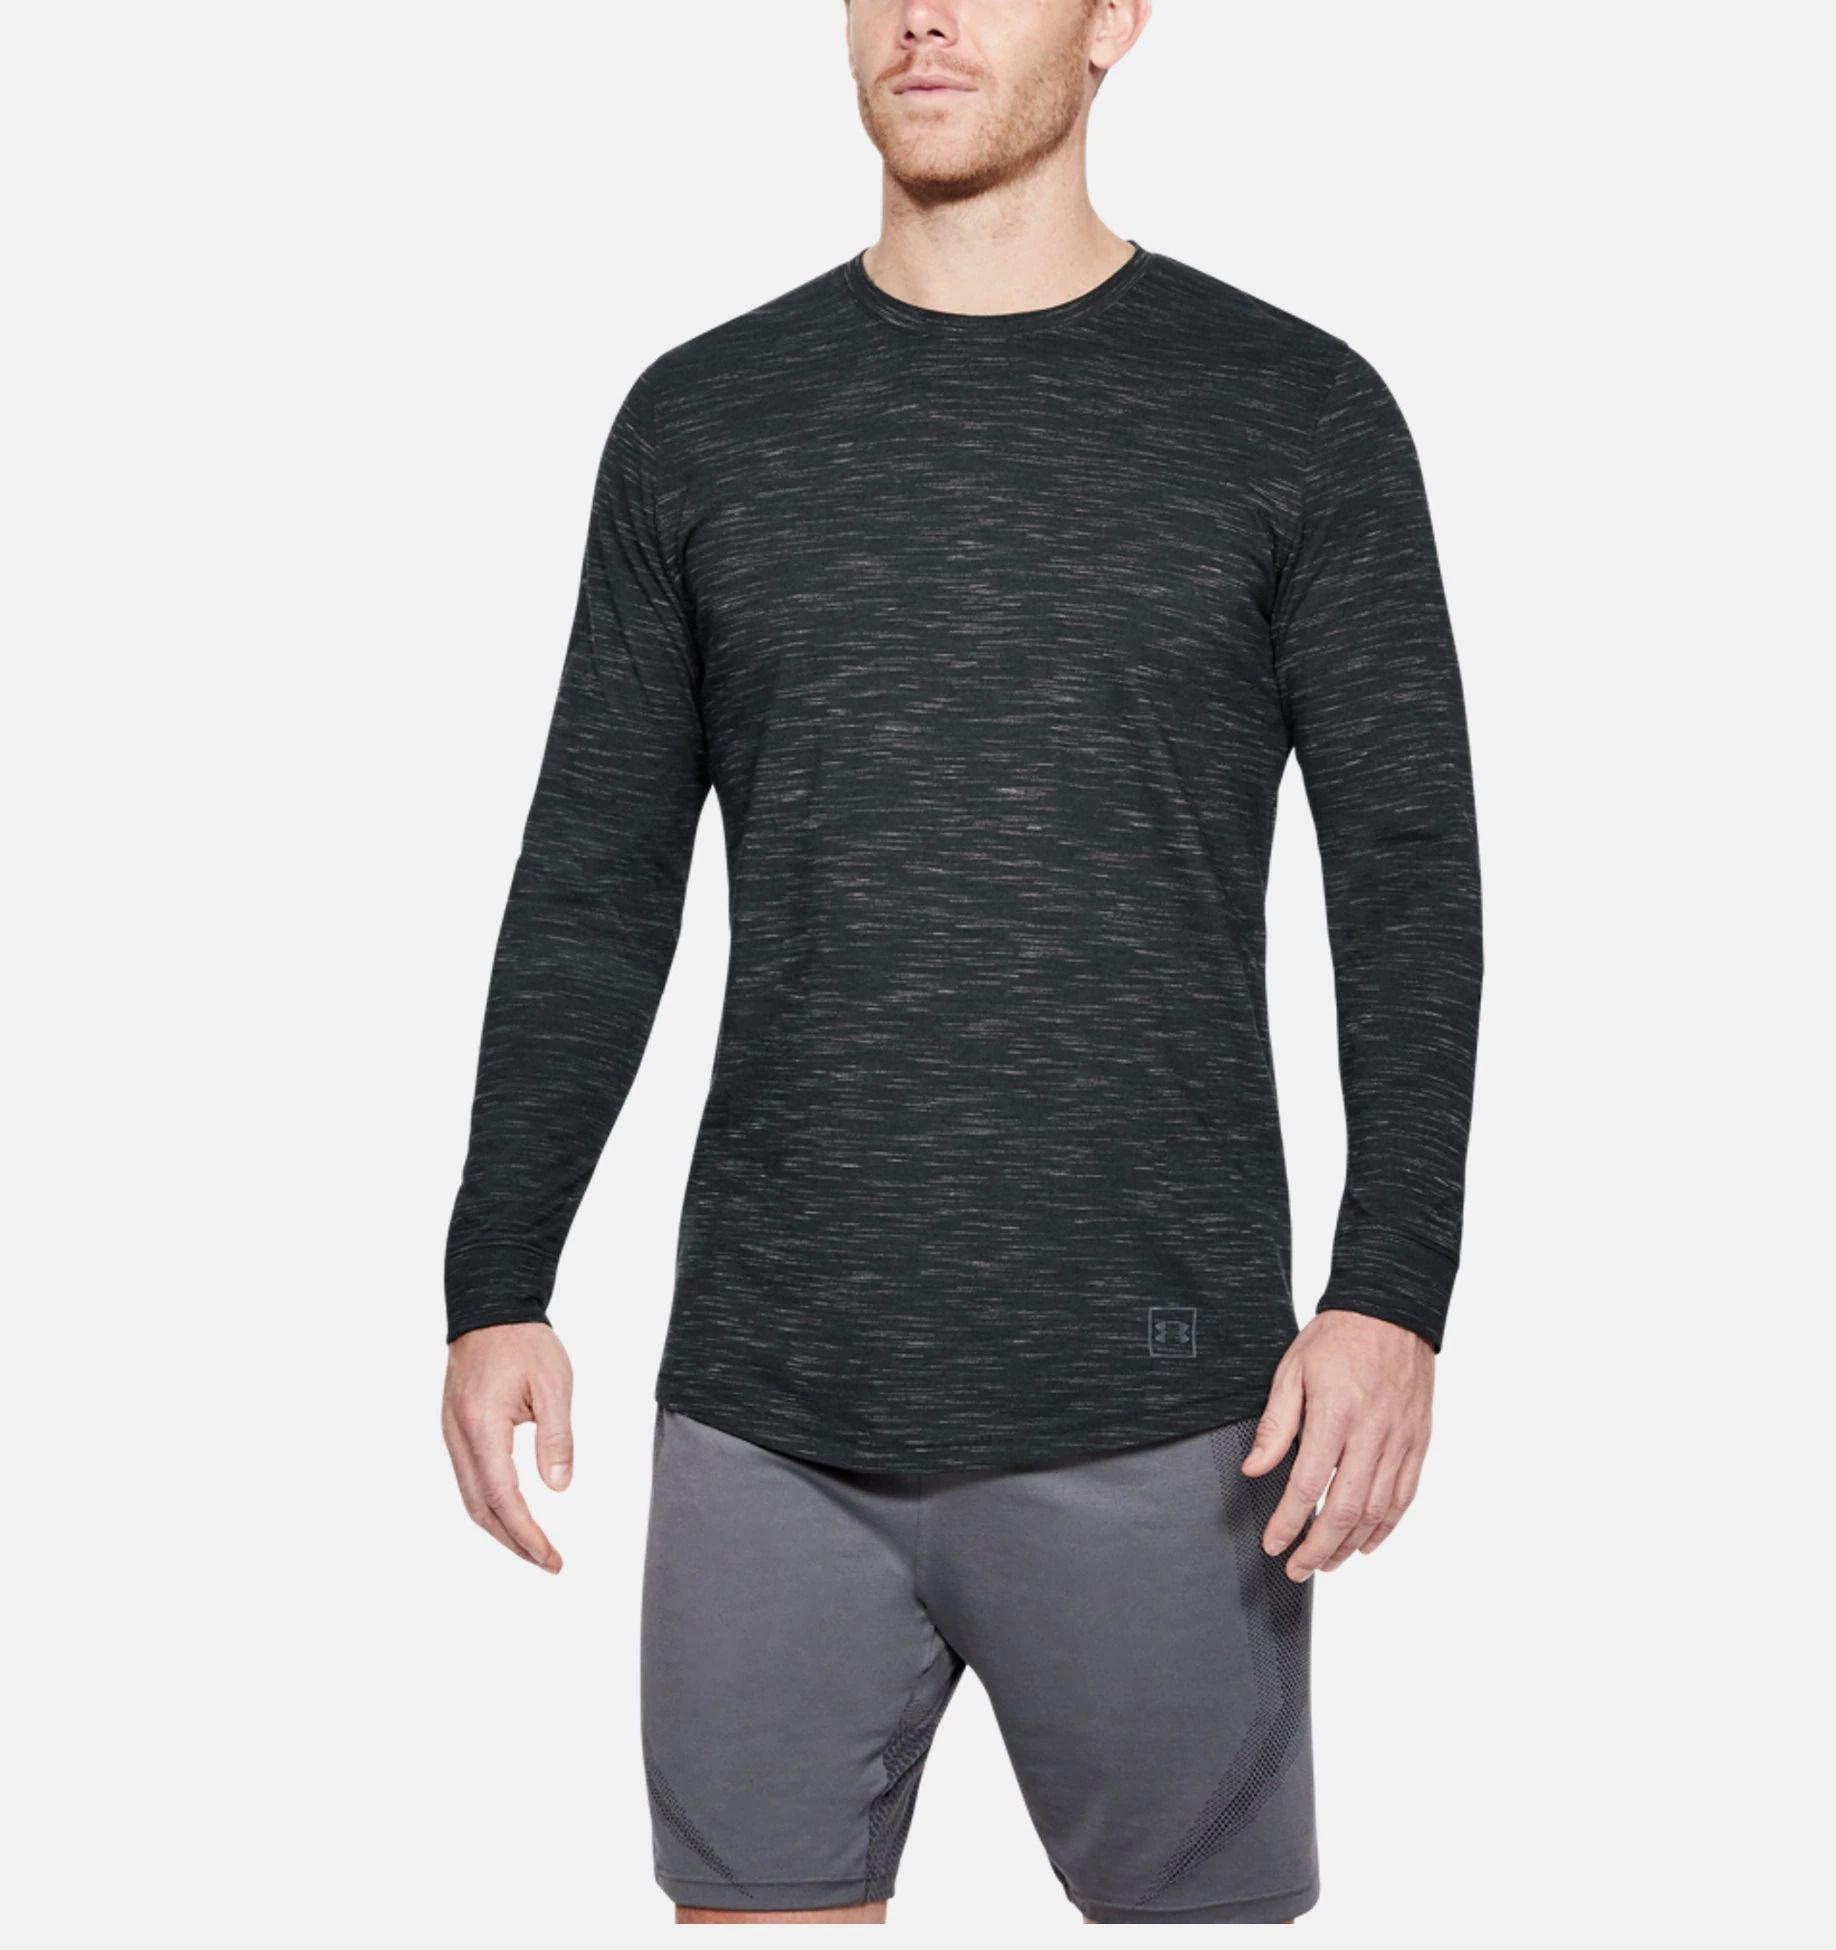 cb63e003bef8c Camiseta Masculina Under Armour Sportstyle Tee - BRACIA SHOP: Loja ...